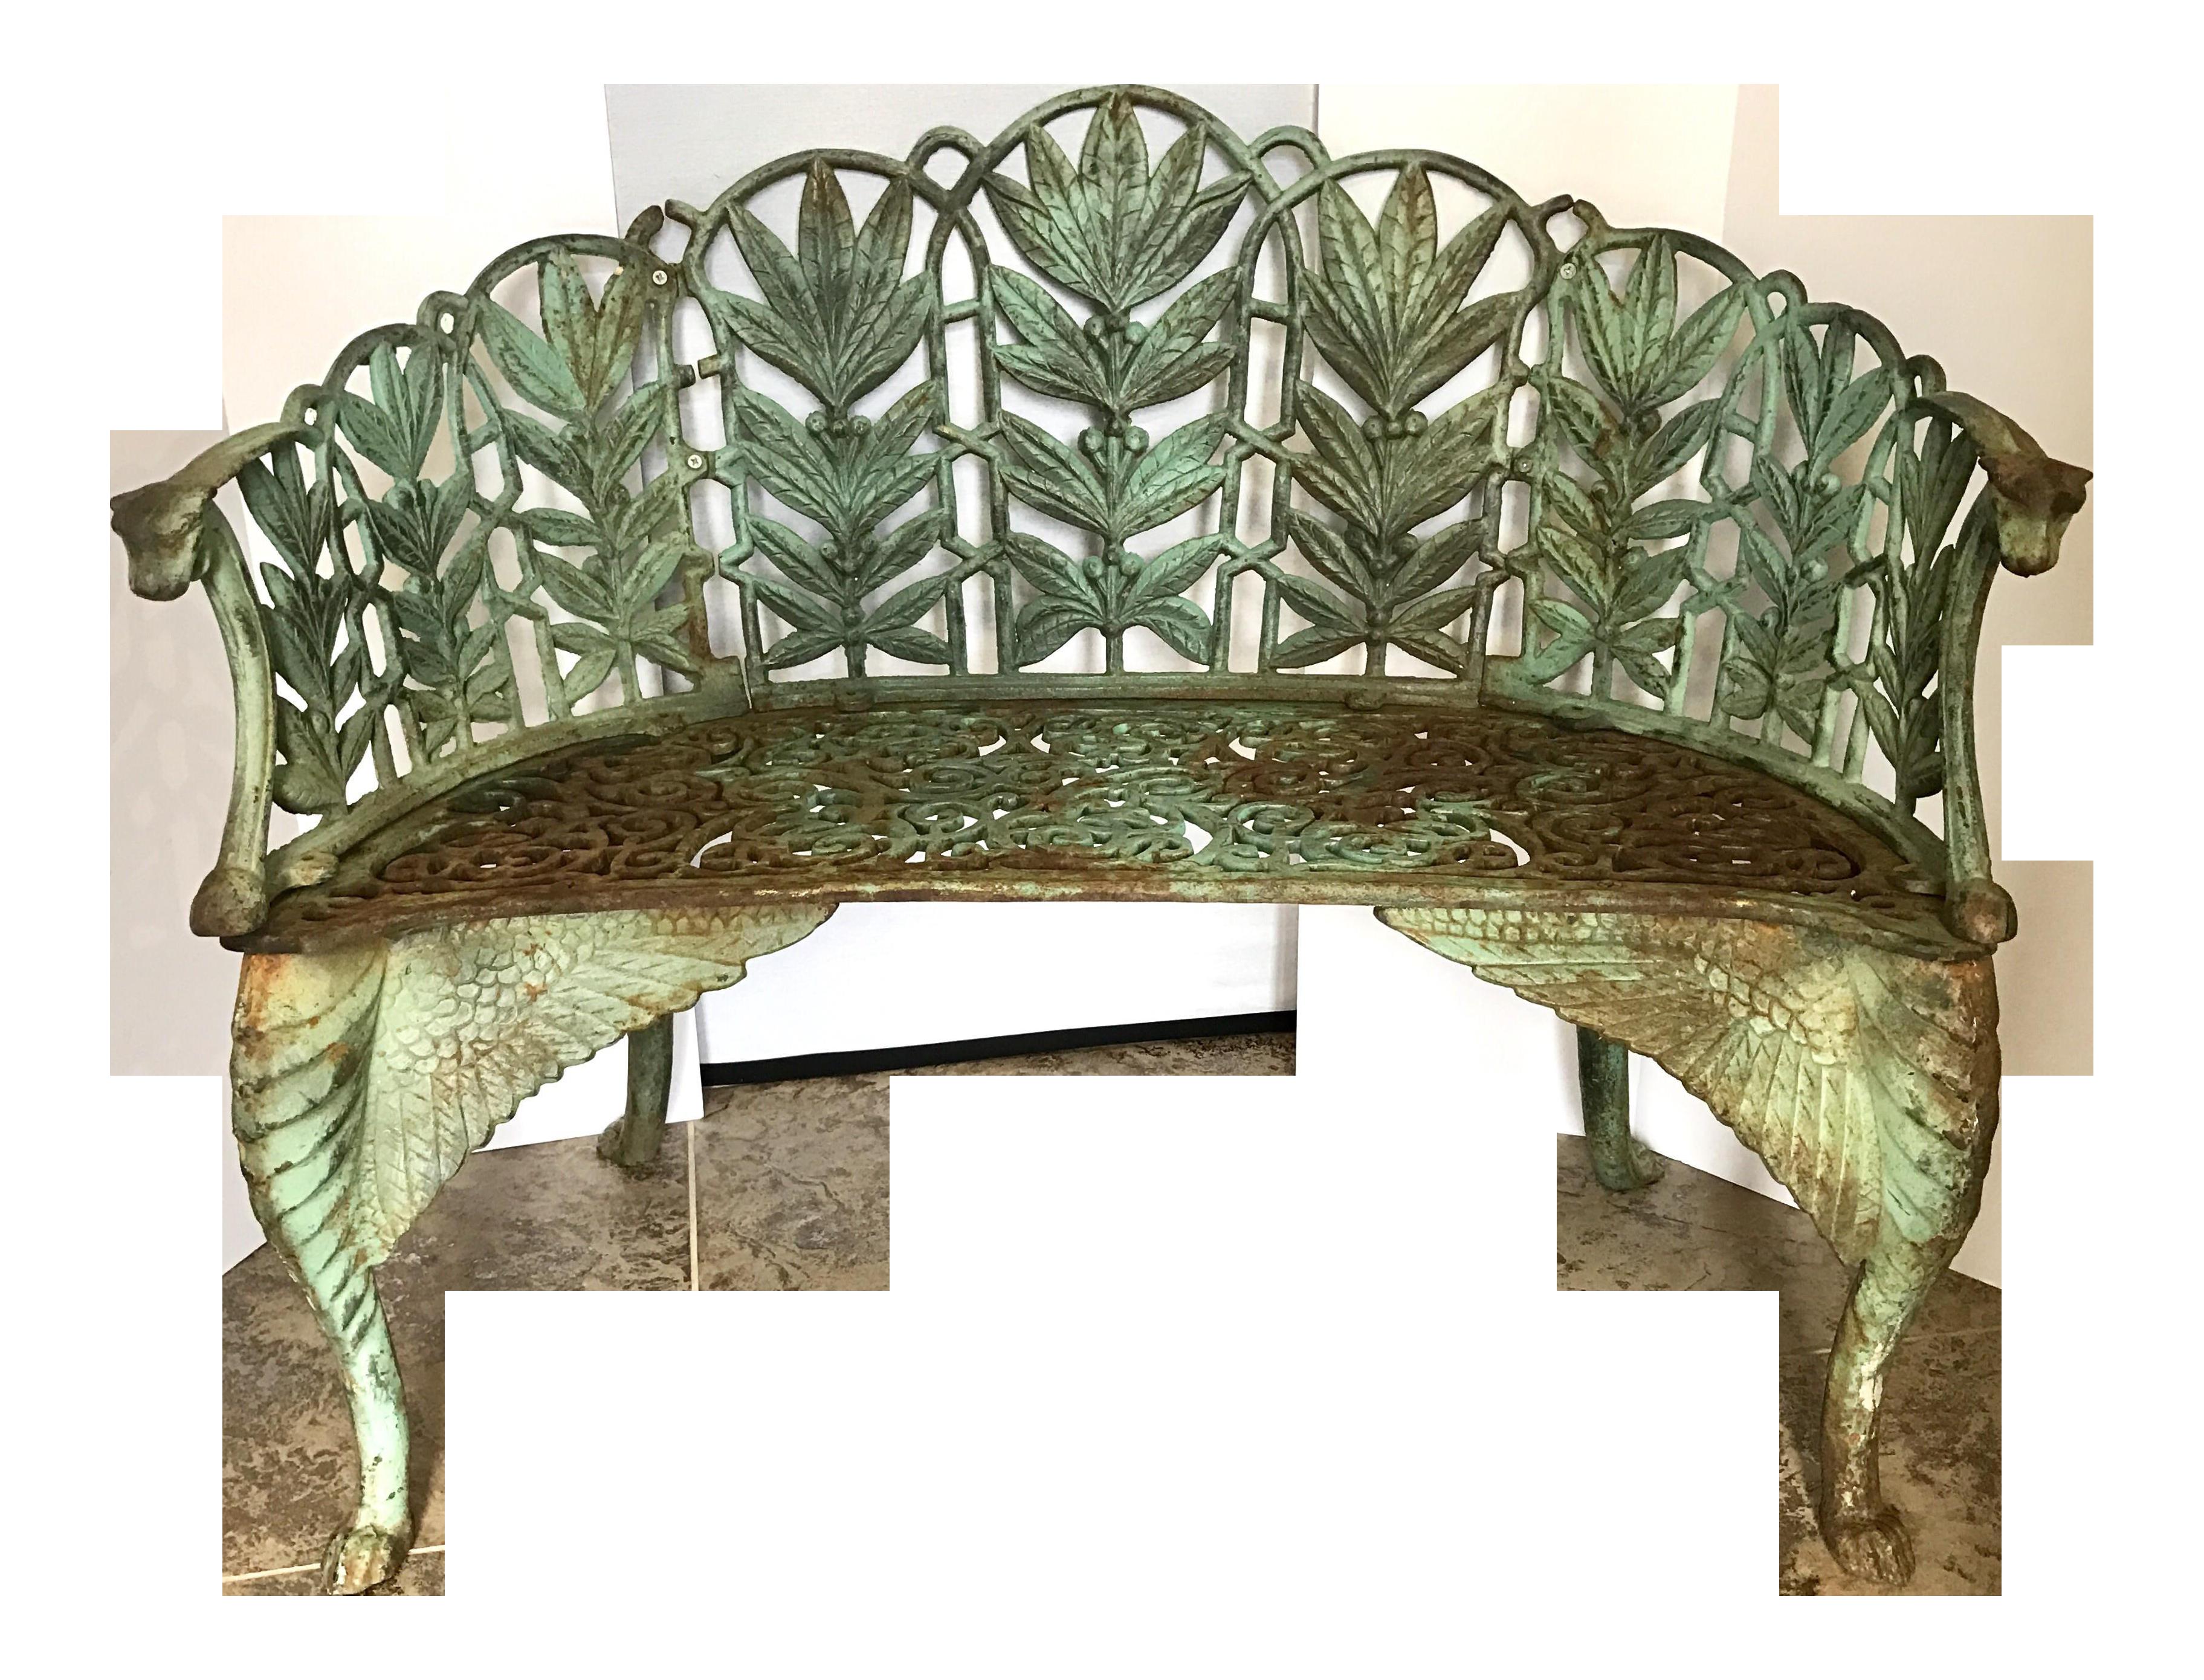 Superior 19th Century Art Nouveau Cast Iron Winged Garden Bench